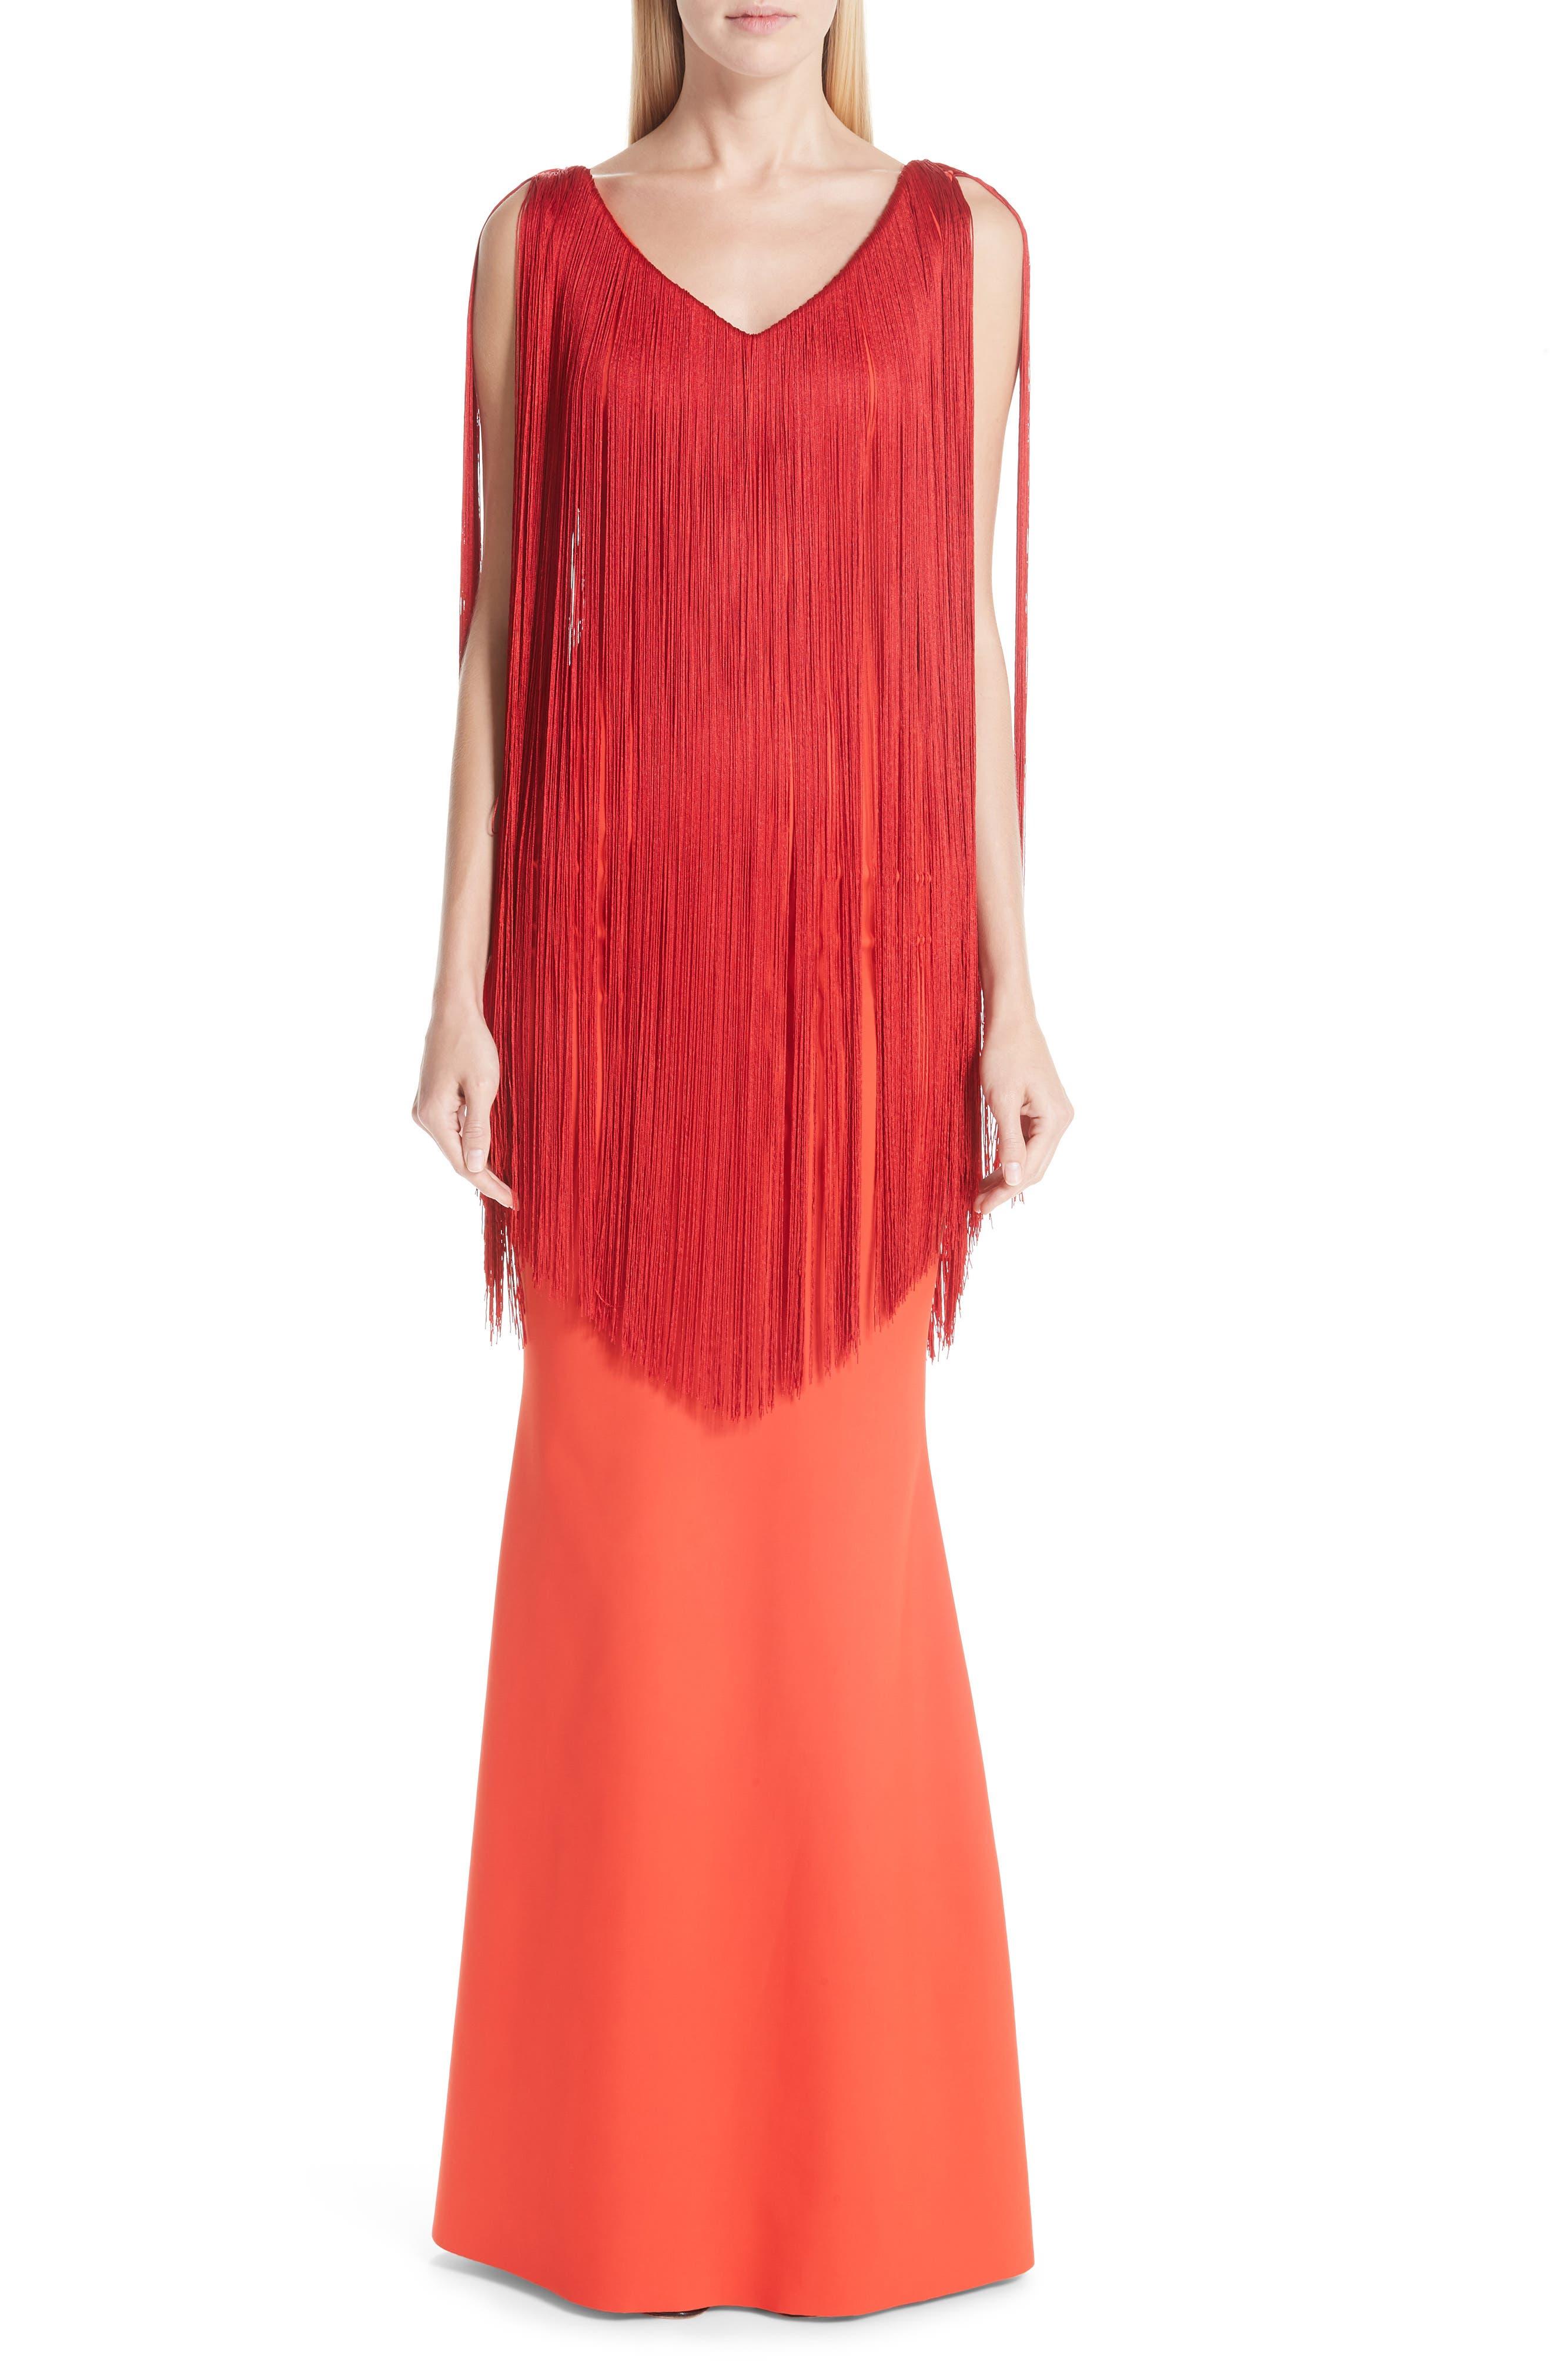 Chiara Boni La Petite Robe Tammy Fringe Evening Dress, 8 IT - Red